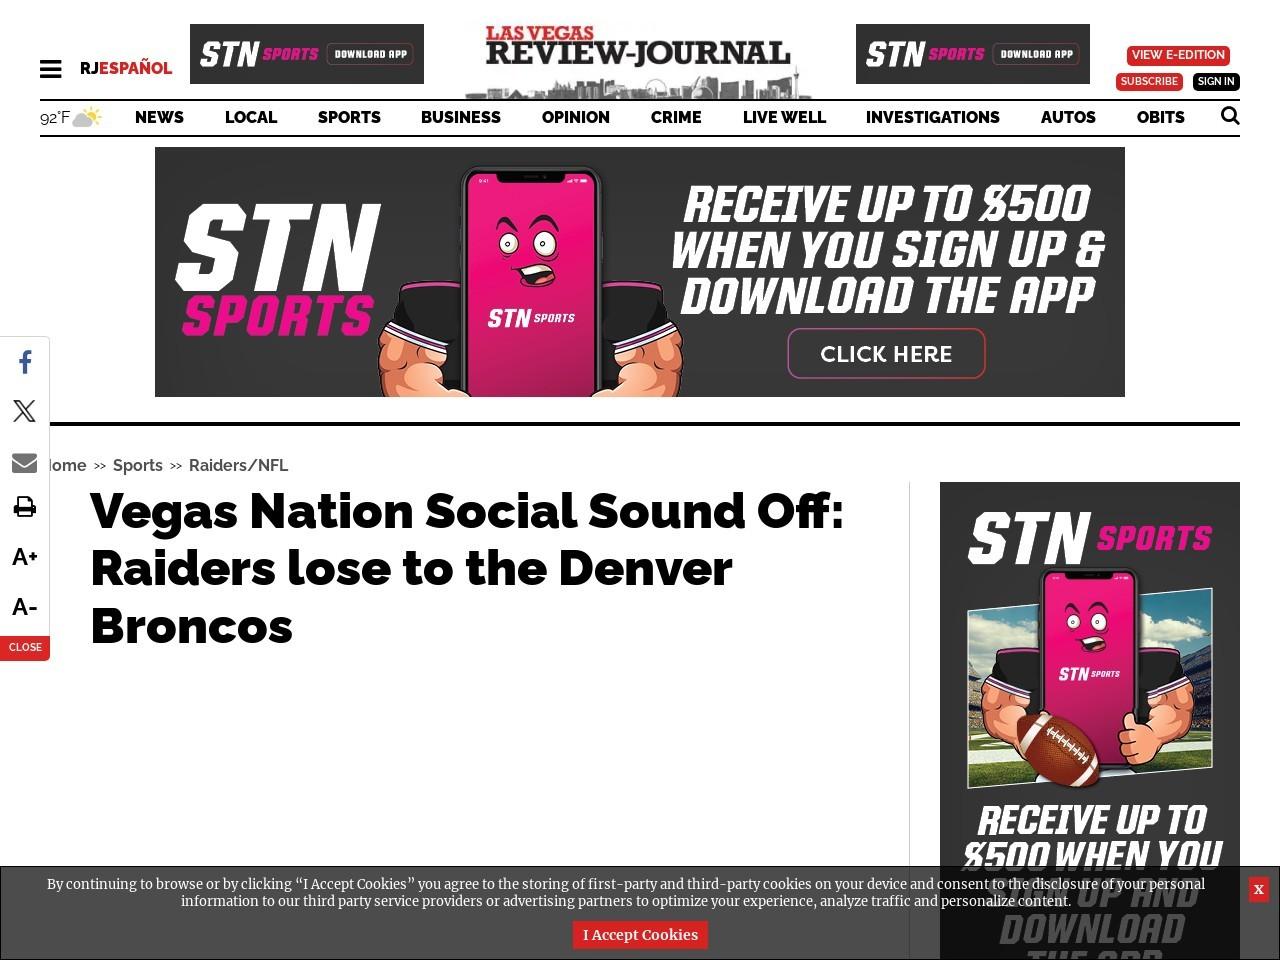 Vegas Nation Social Sound Off: Raiders lose to the Denver Broncos